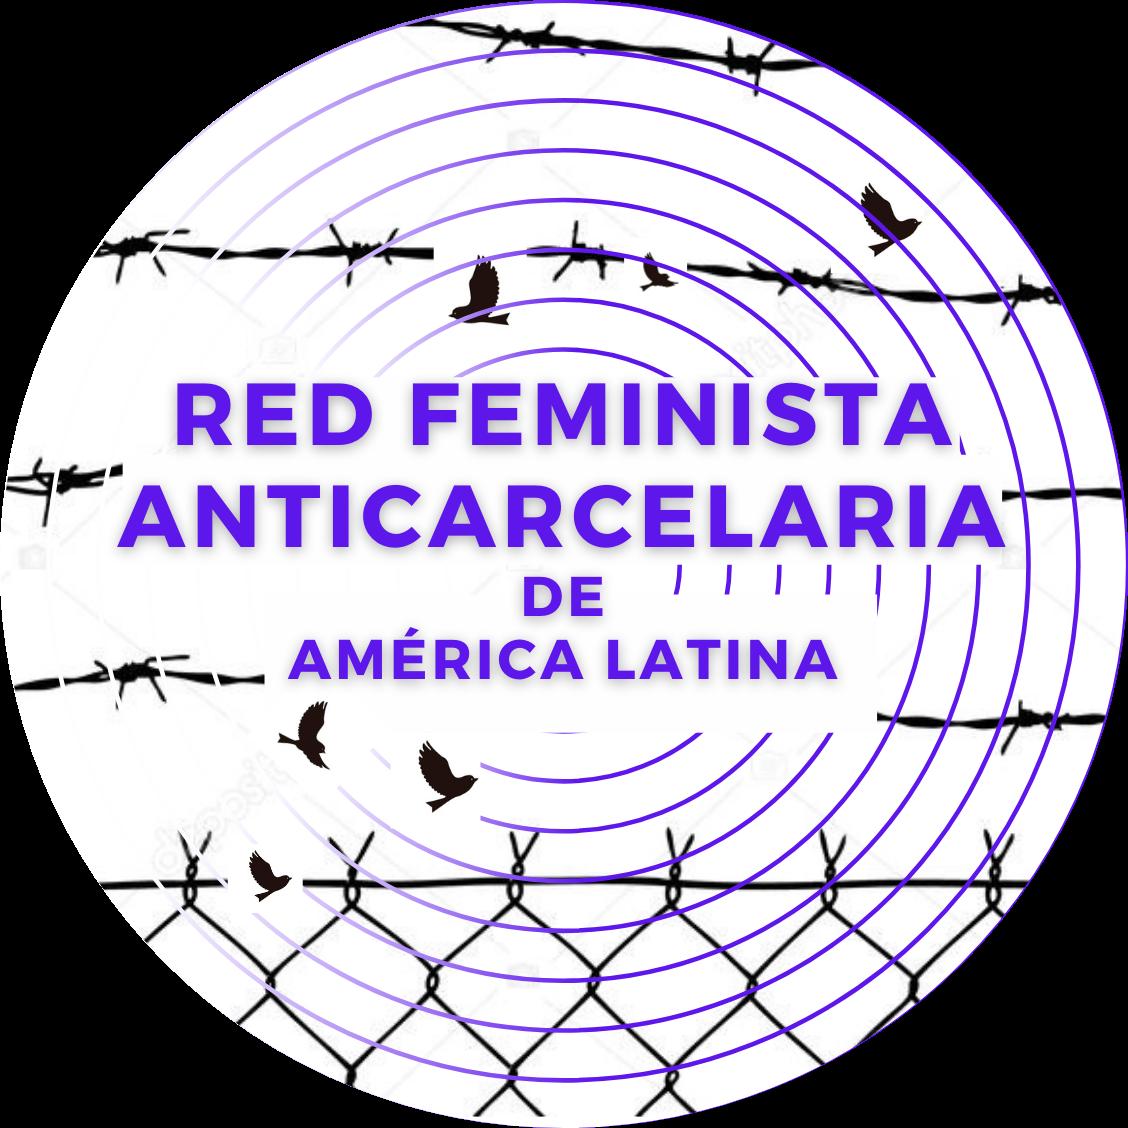 Feministas Anticarcelarias